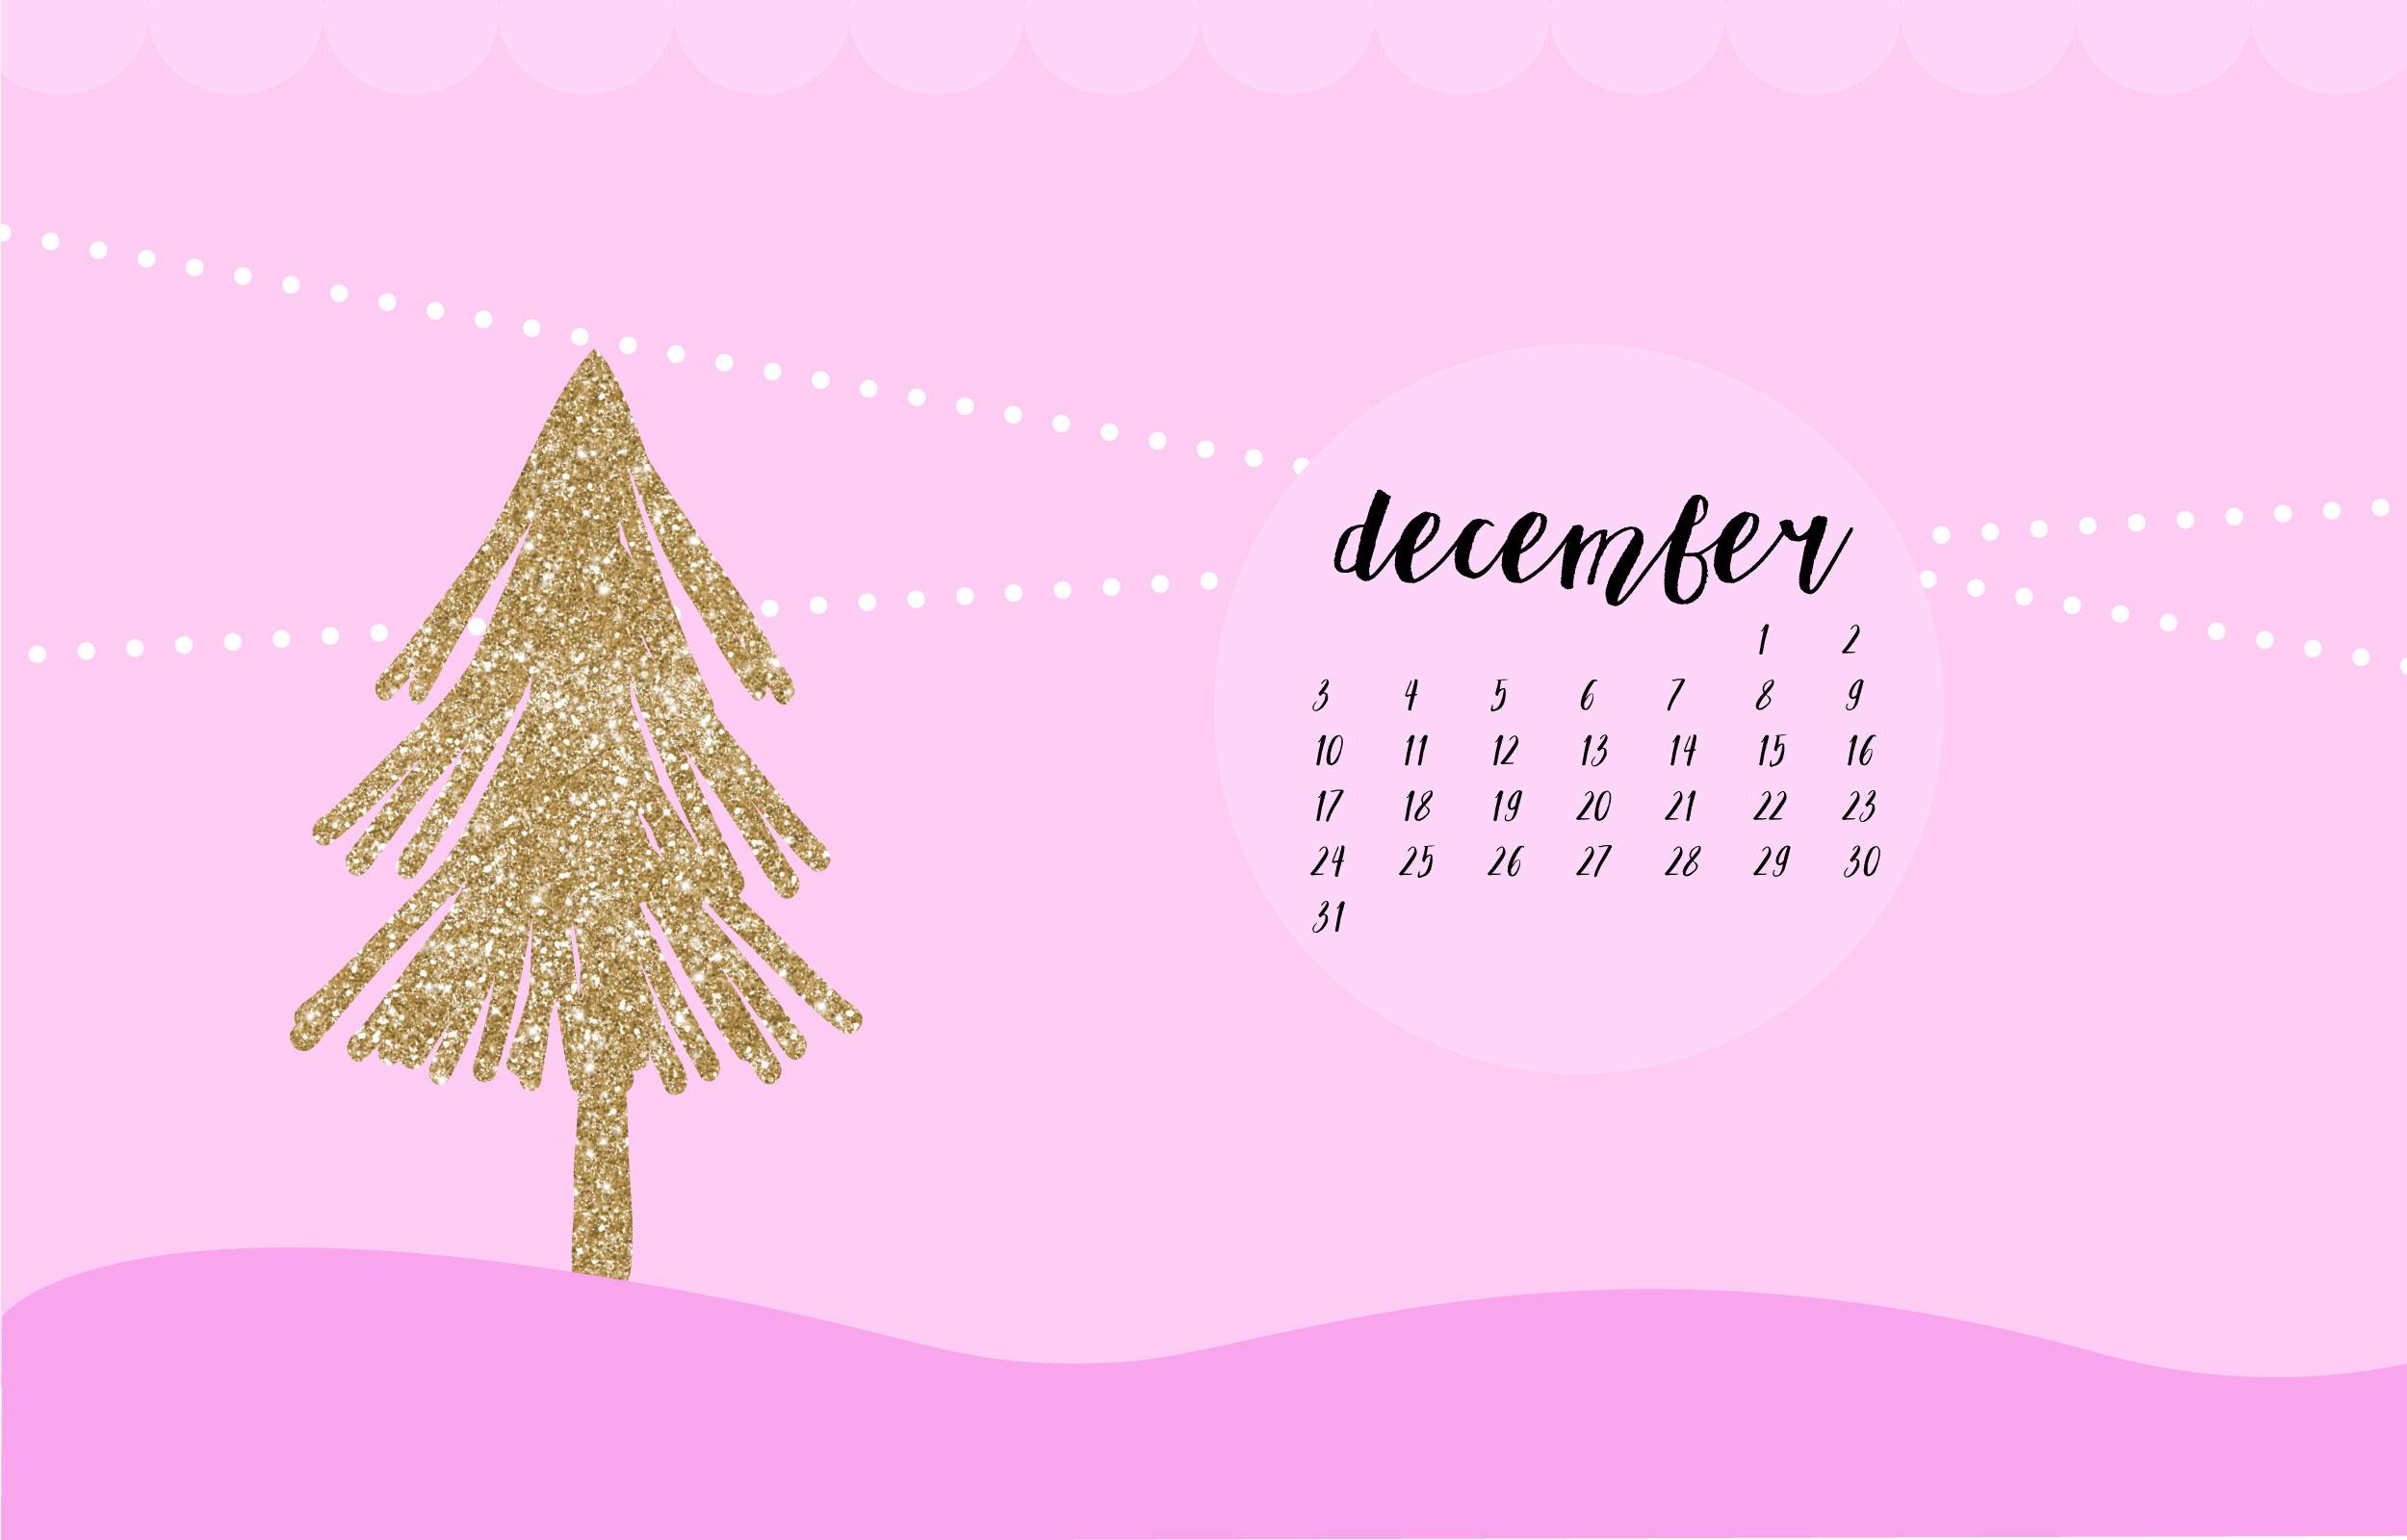 Digital Christmas Wallpaper Glittery Christmas Tree Pink Fantasia